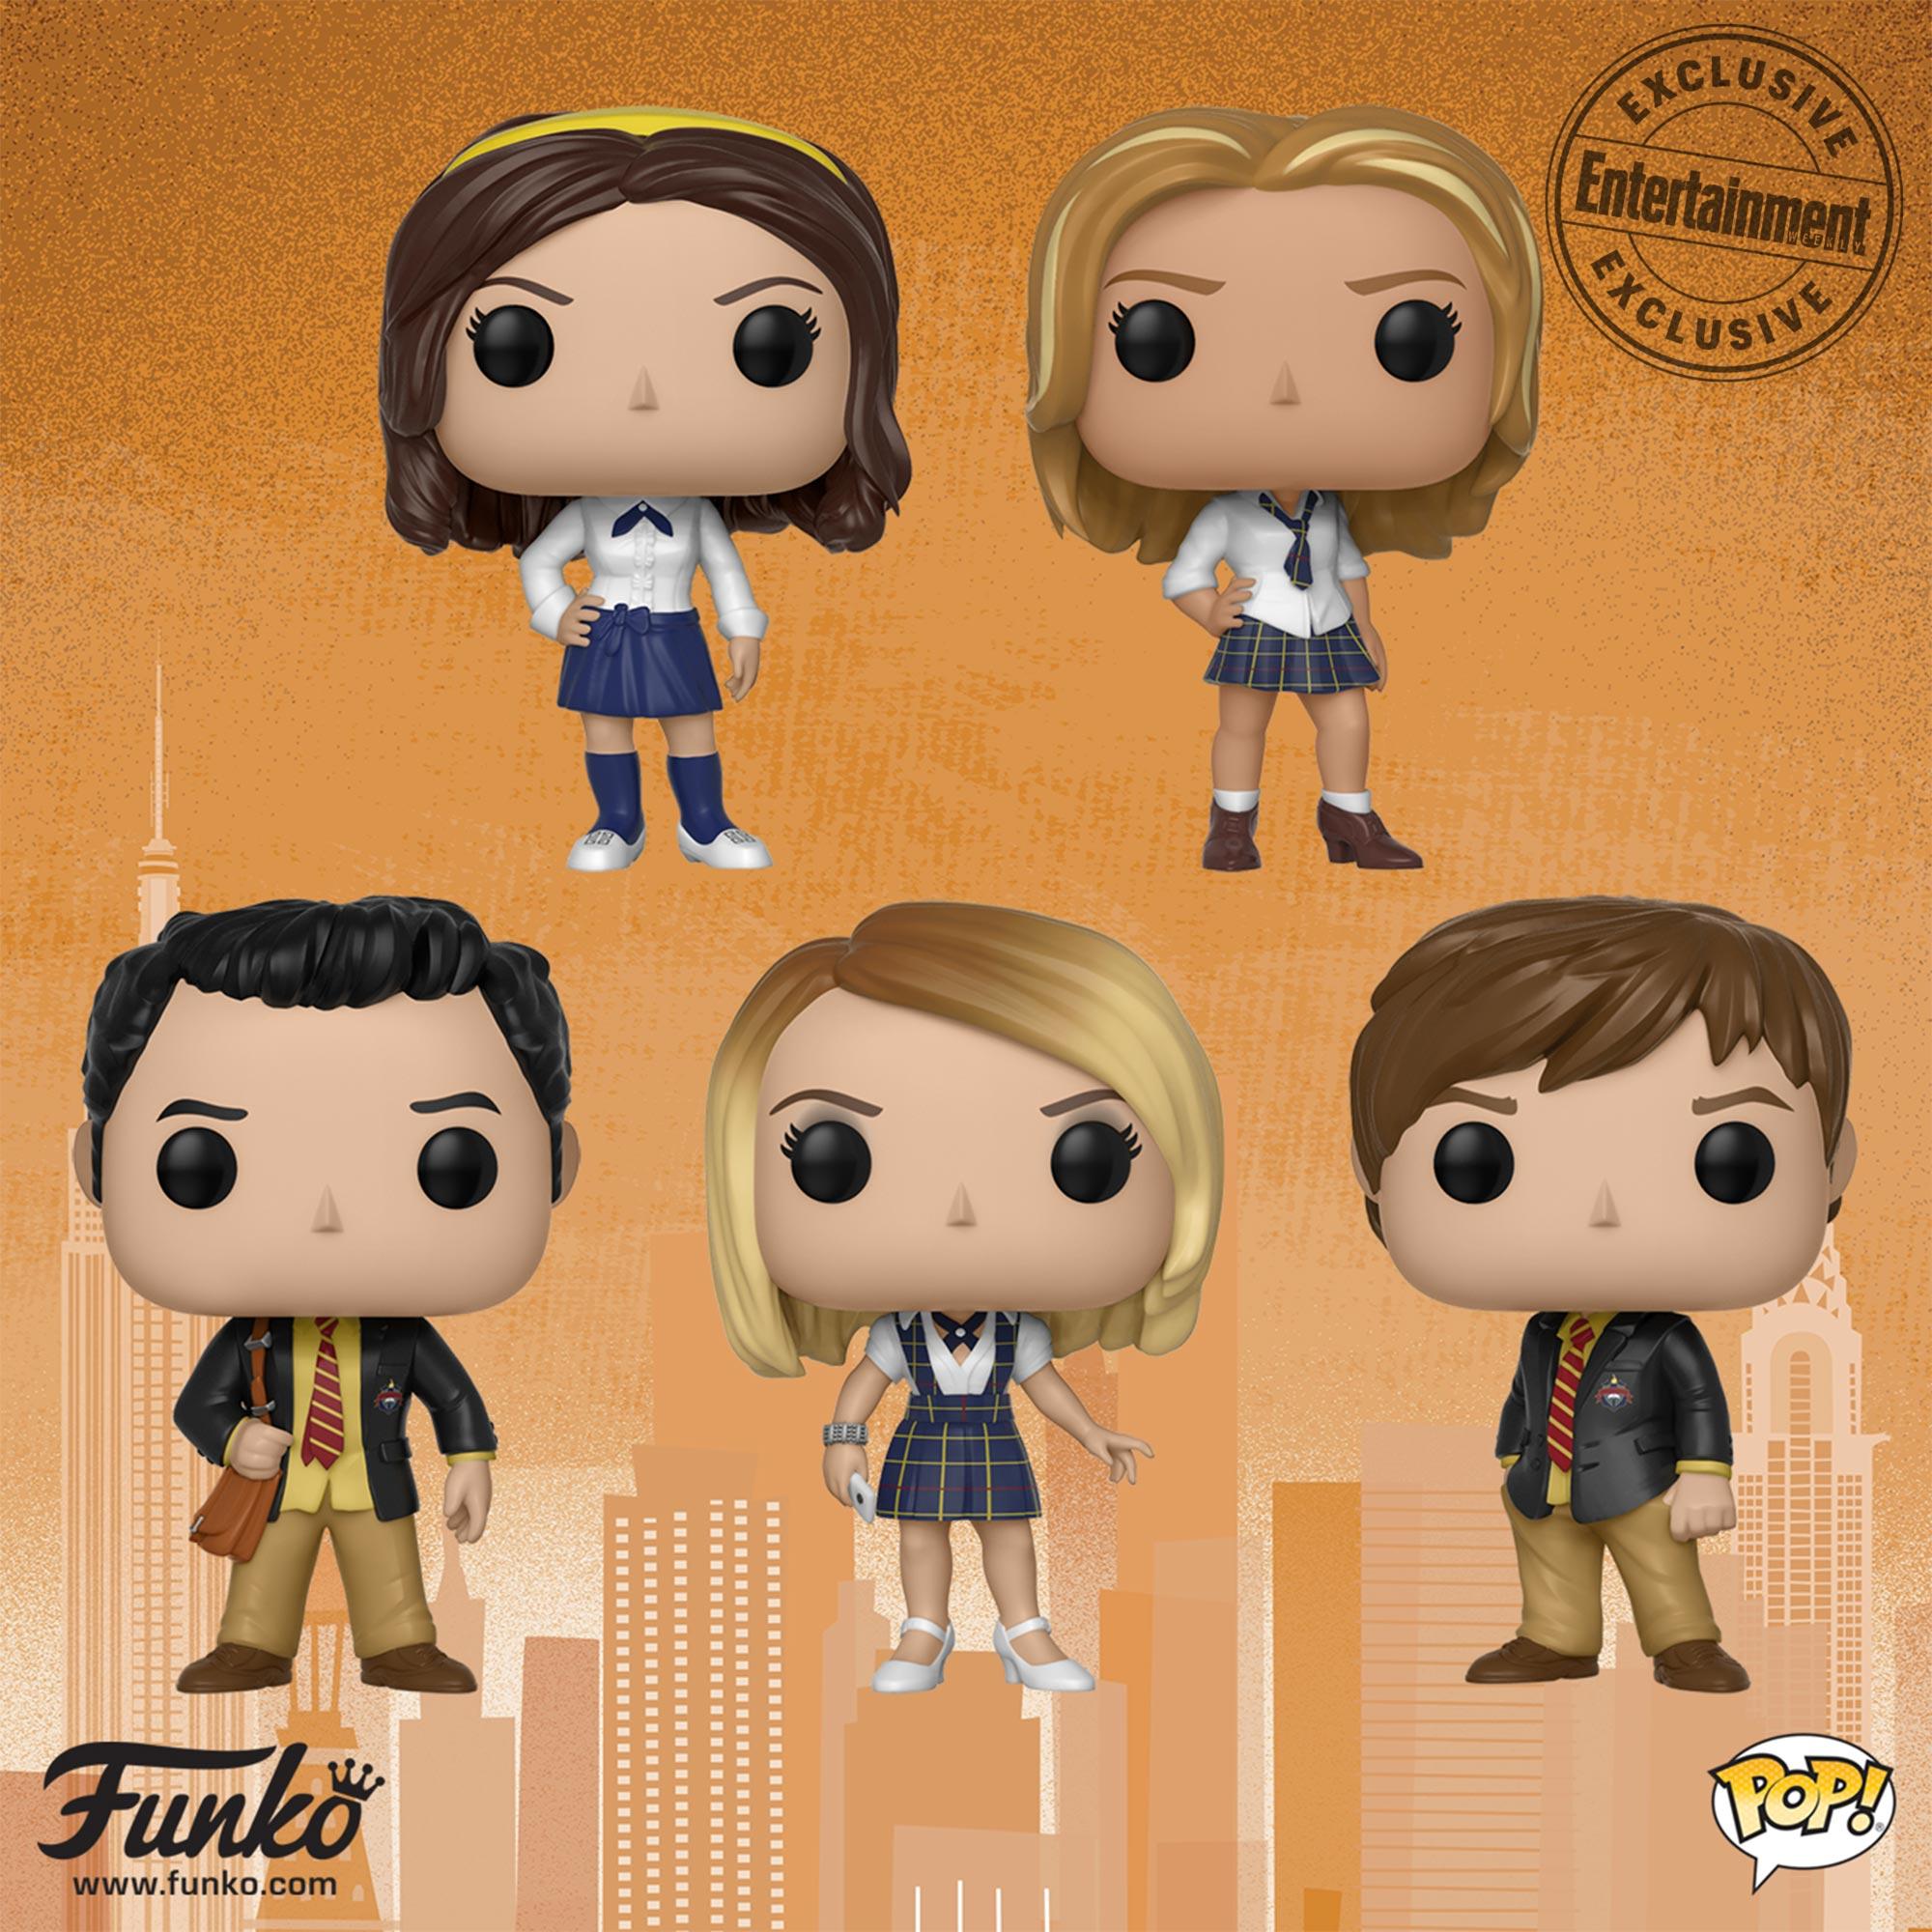 Funko Pop Toy Fair exclusives